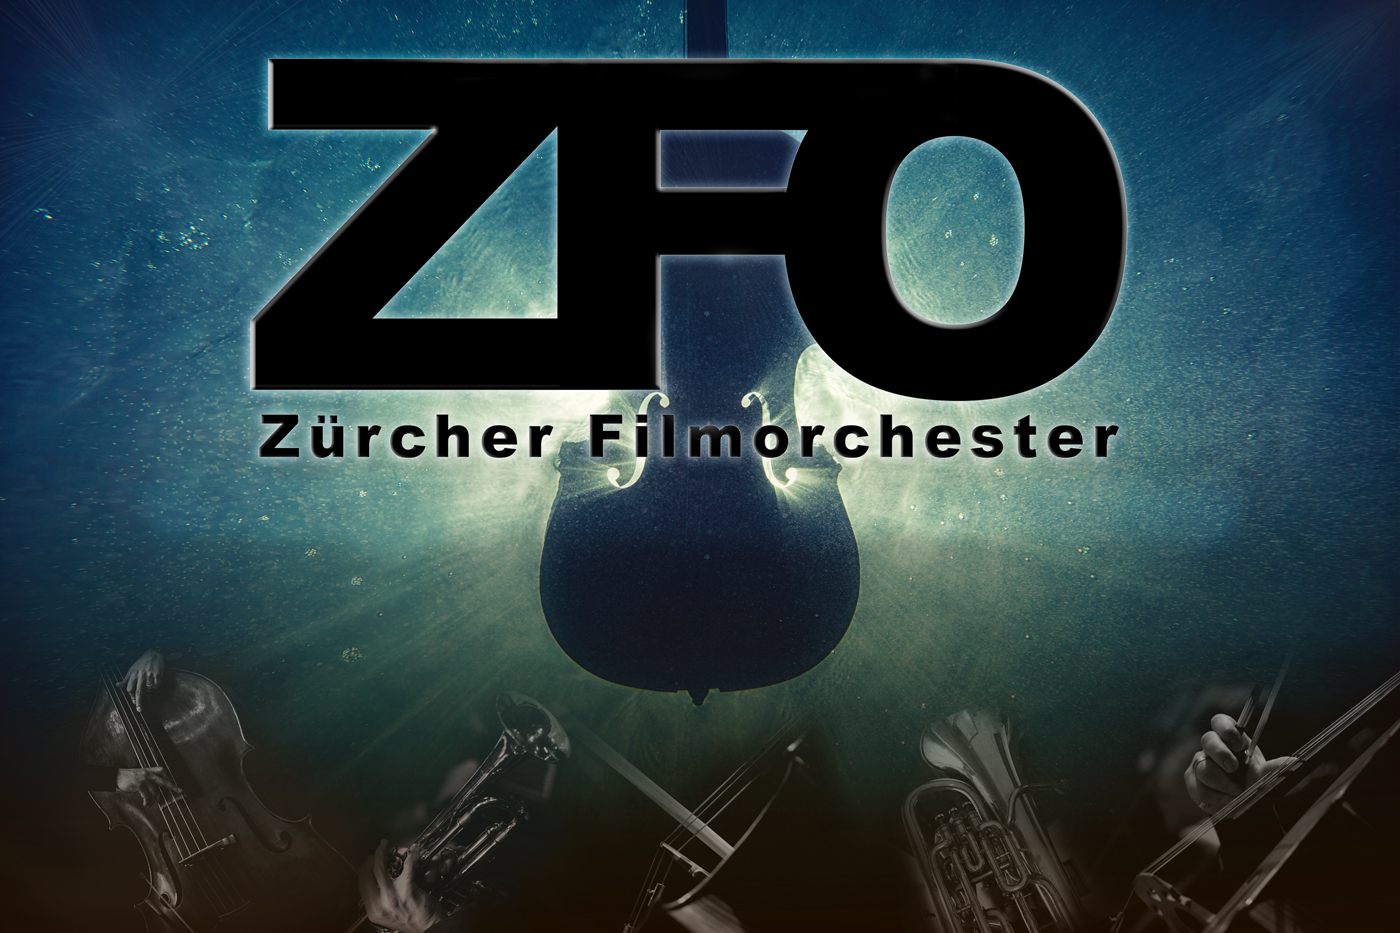 Zuercher_Filmorchester_ZFO_Titelbild